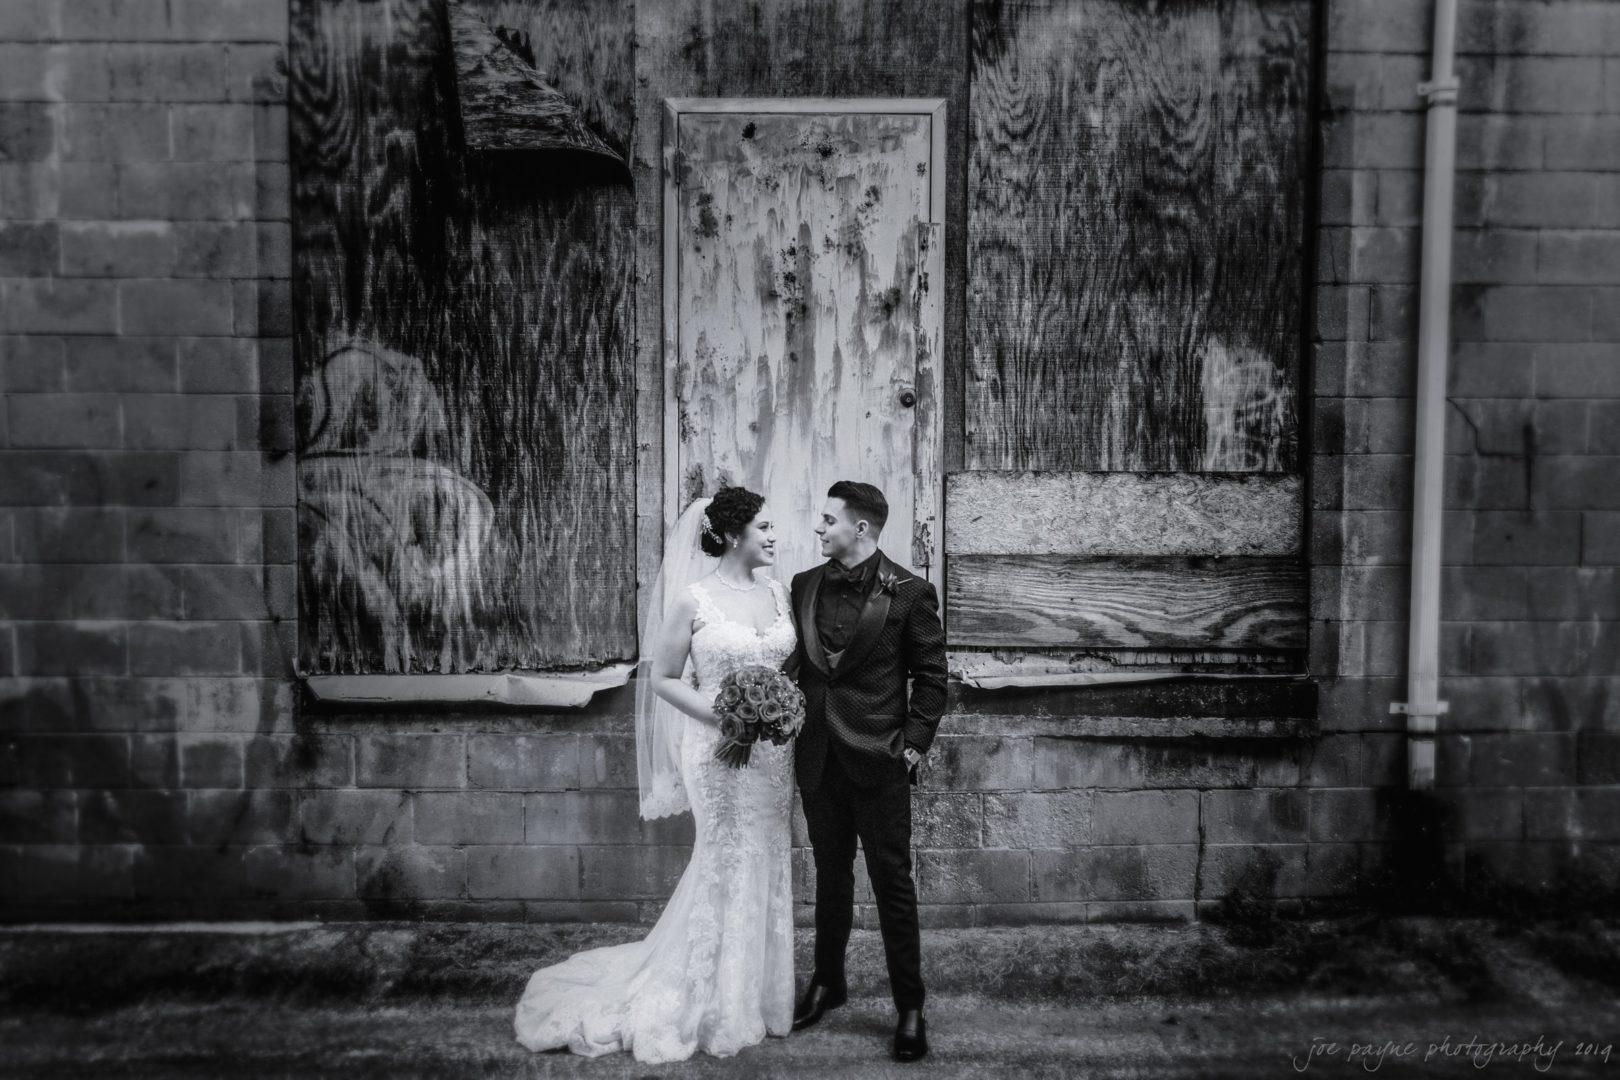 melrose knitting mill raleigh wedding photographer melanie anthony 65